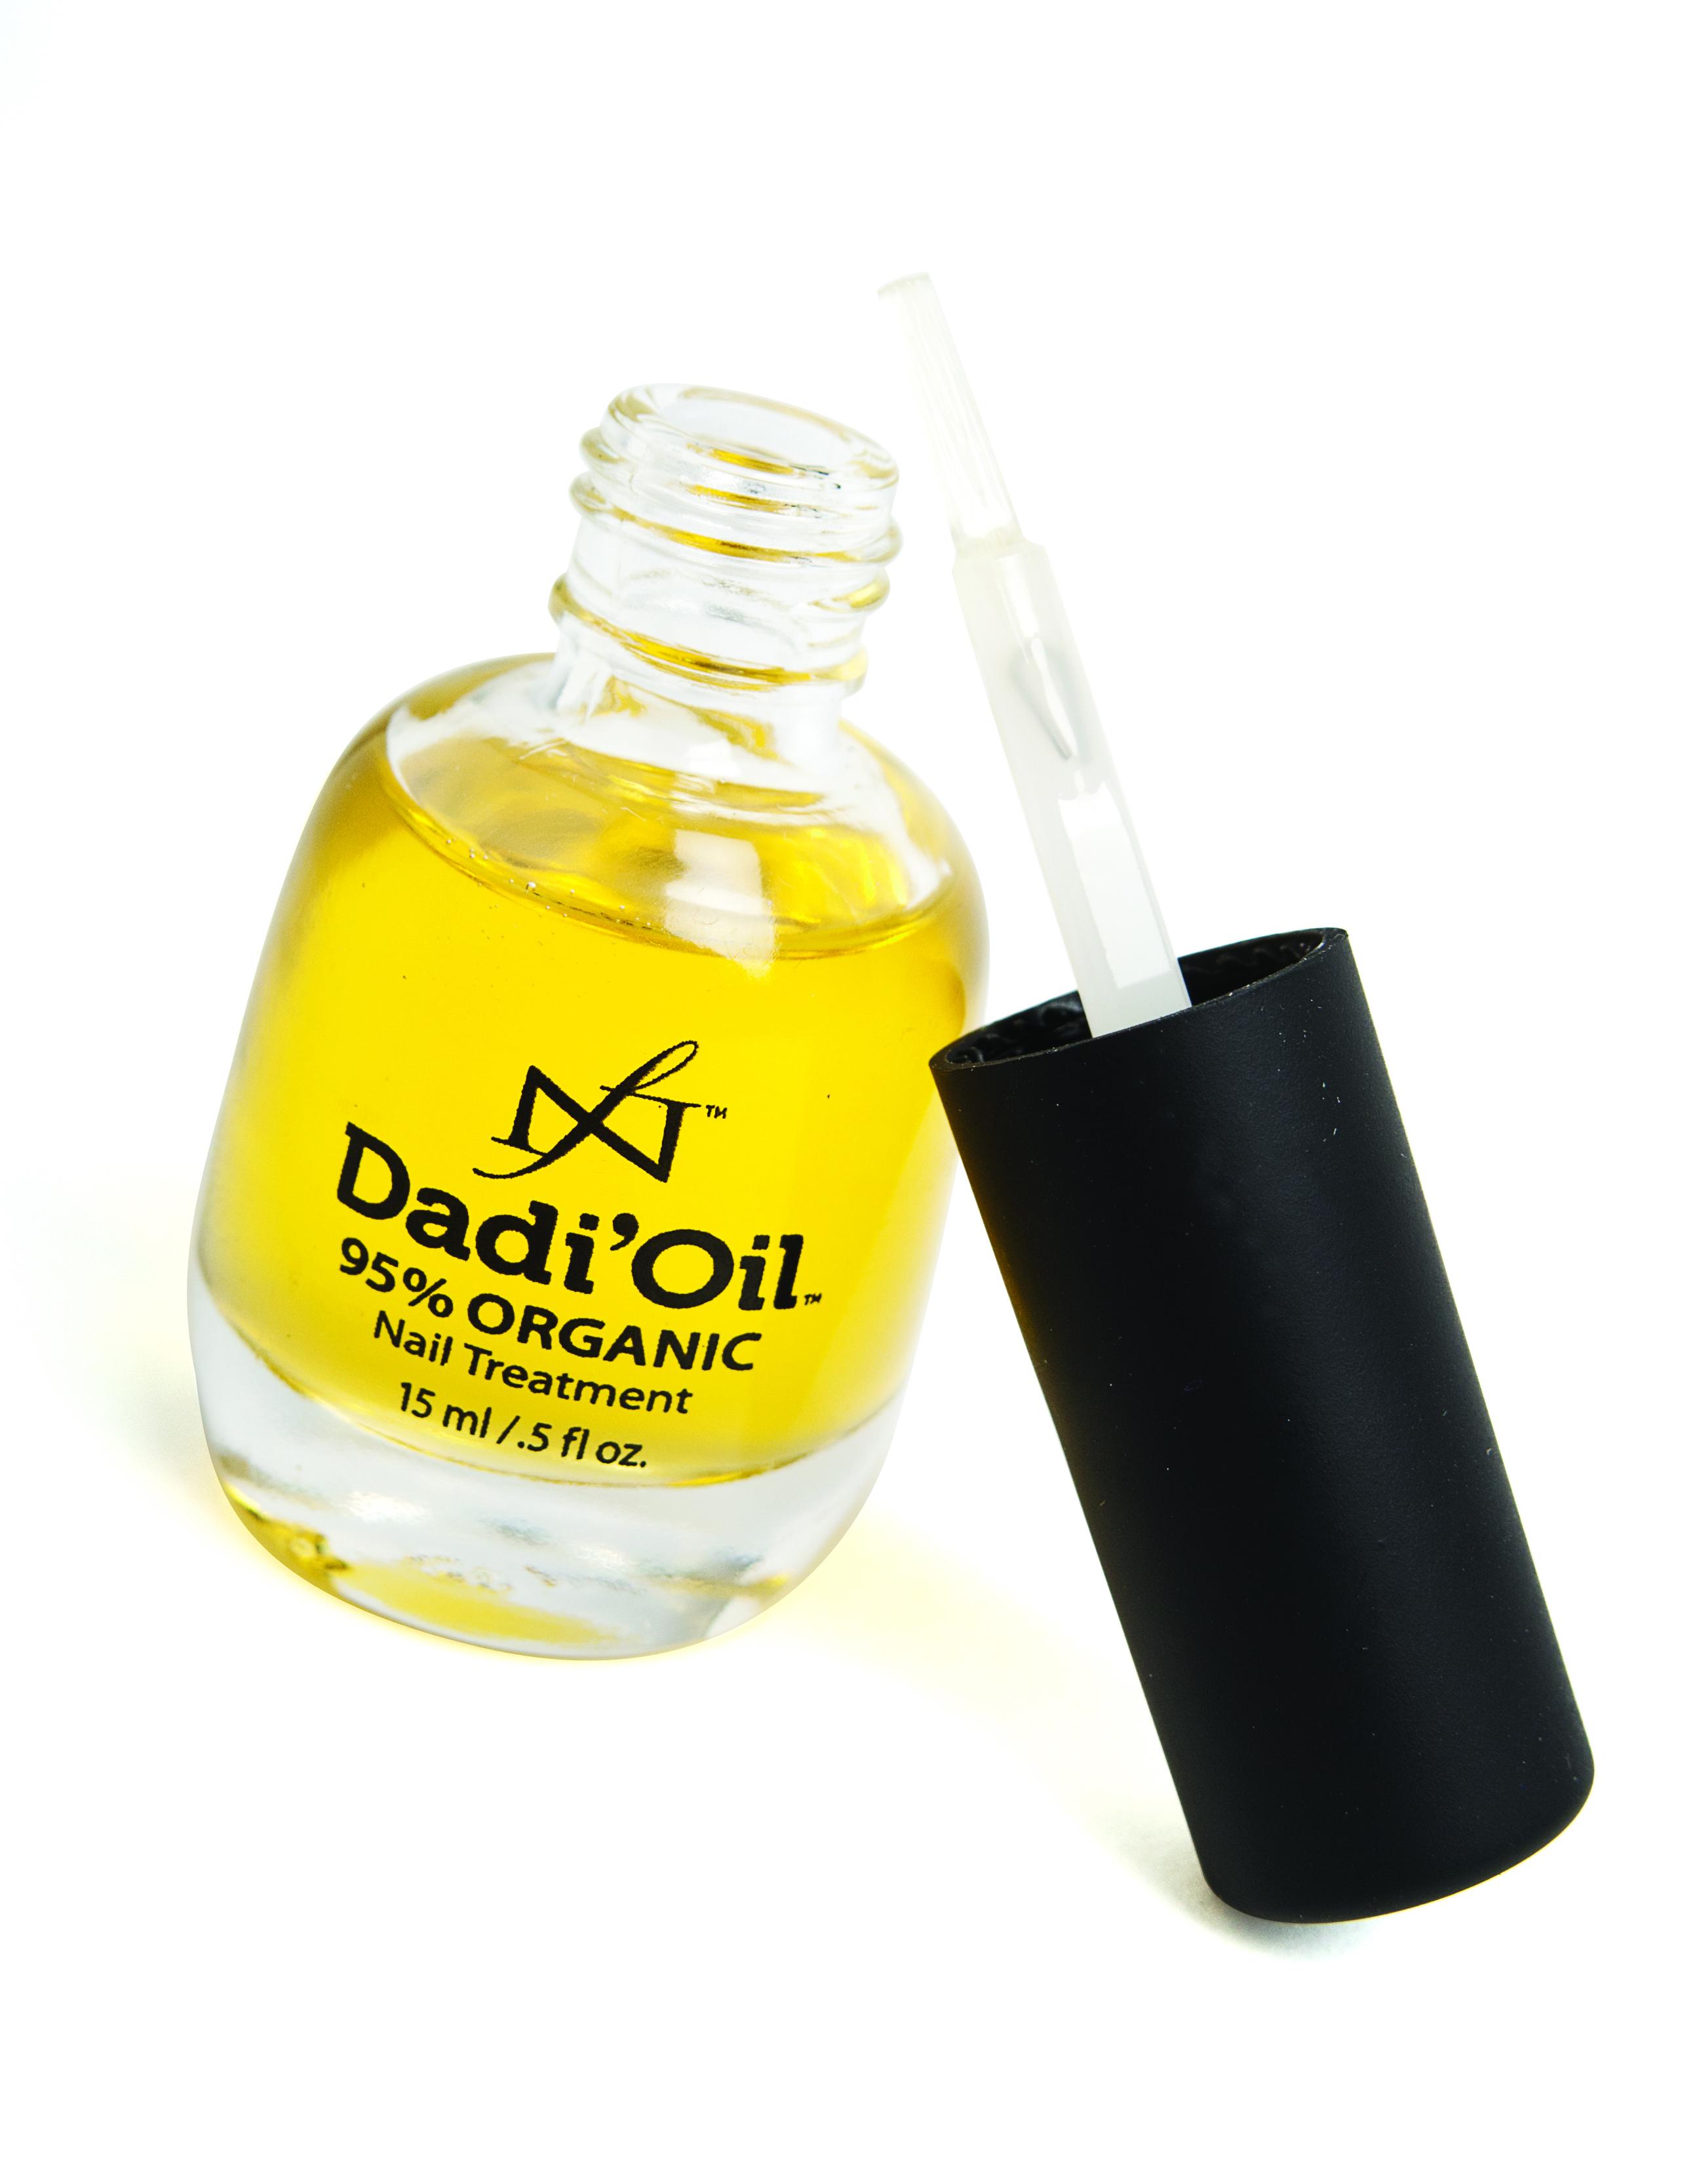 Dadi'Oil Nail Treatment